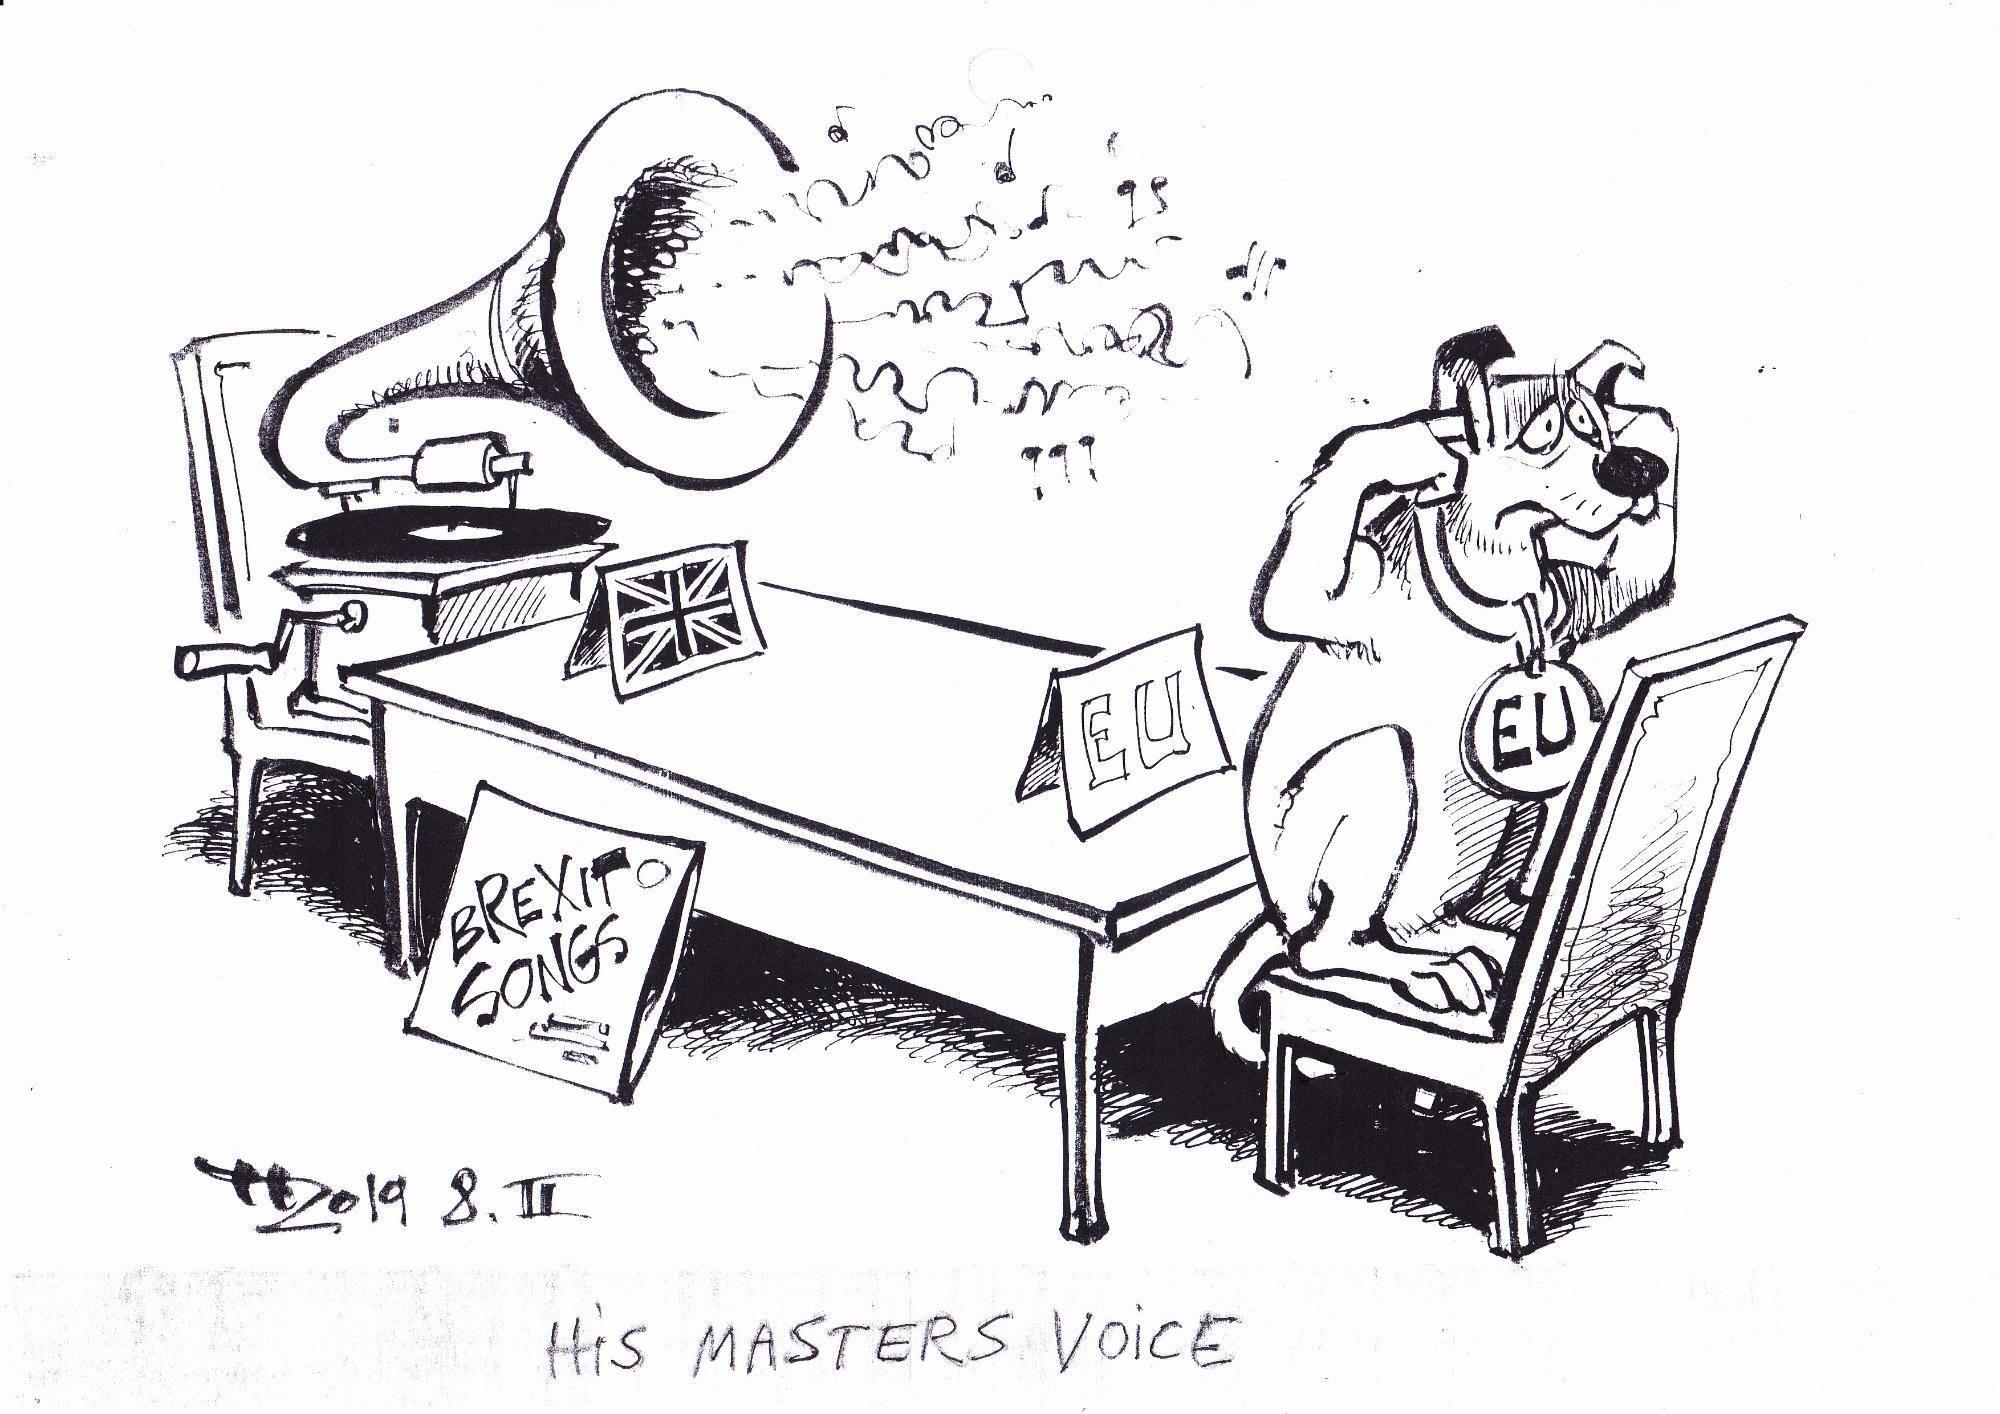 Brexit Political Cartoon (Haitzinger)